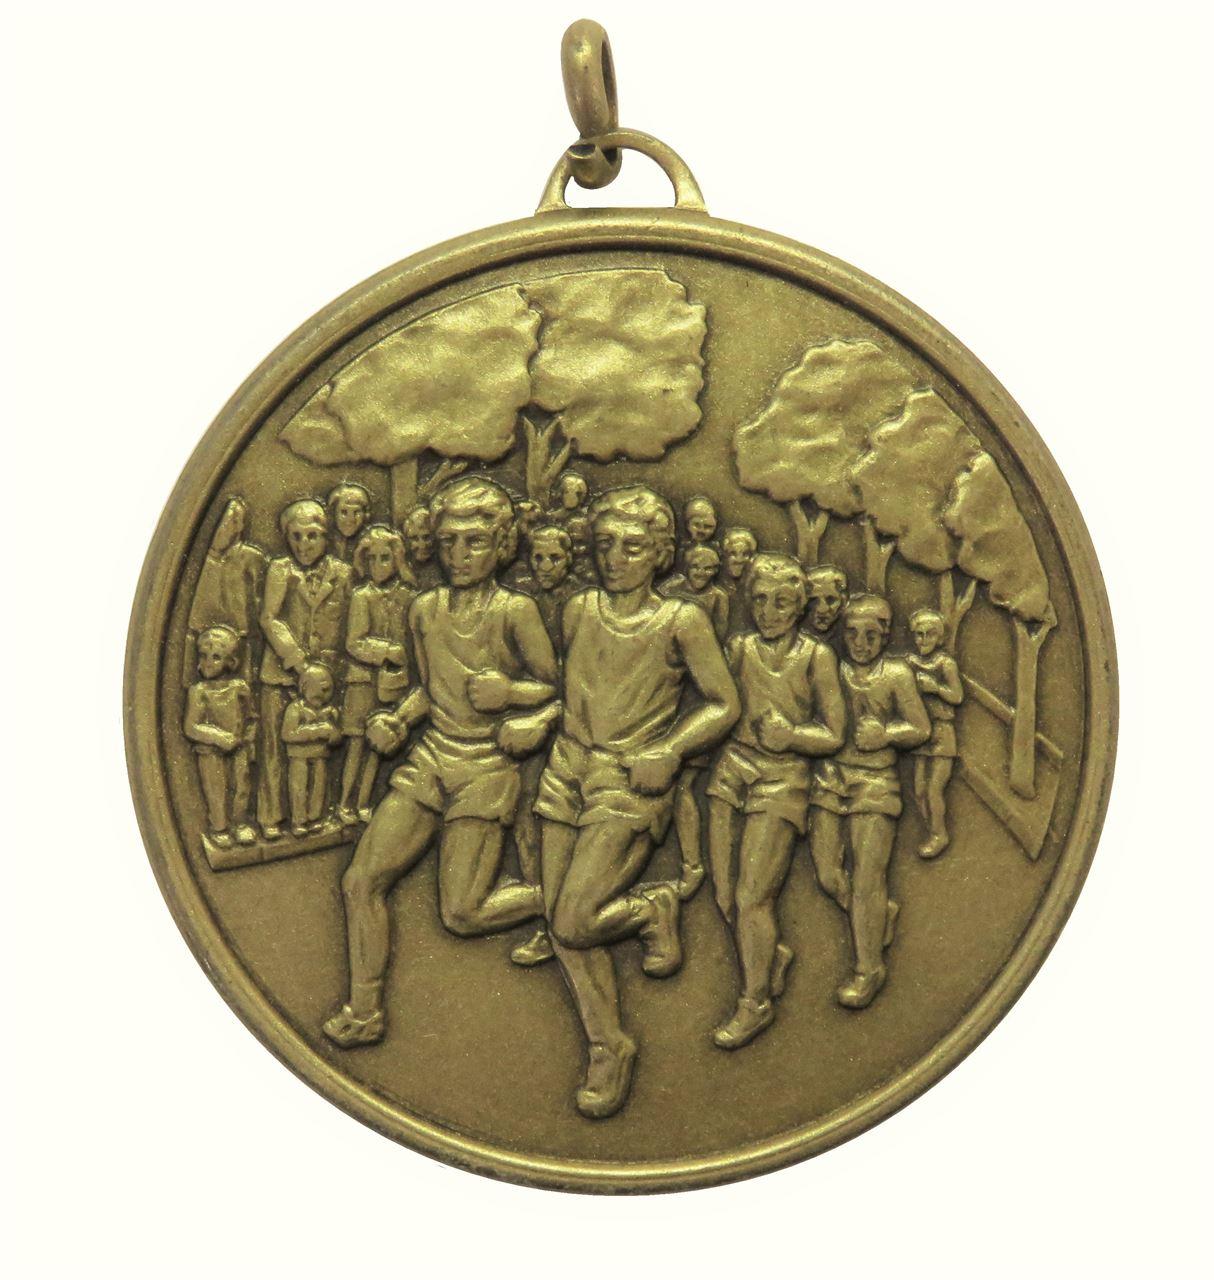 Bronze Economy Runners Medal (size: 50mm) - 397E